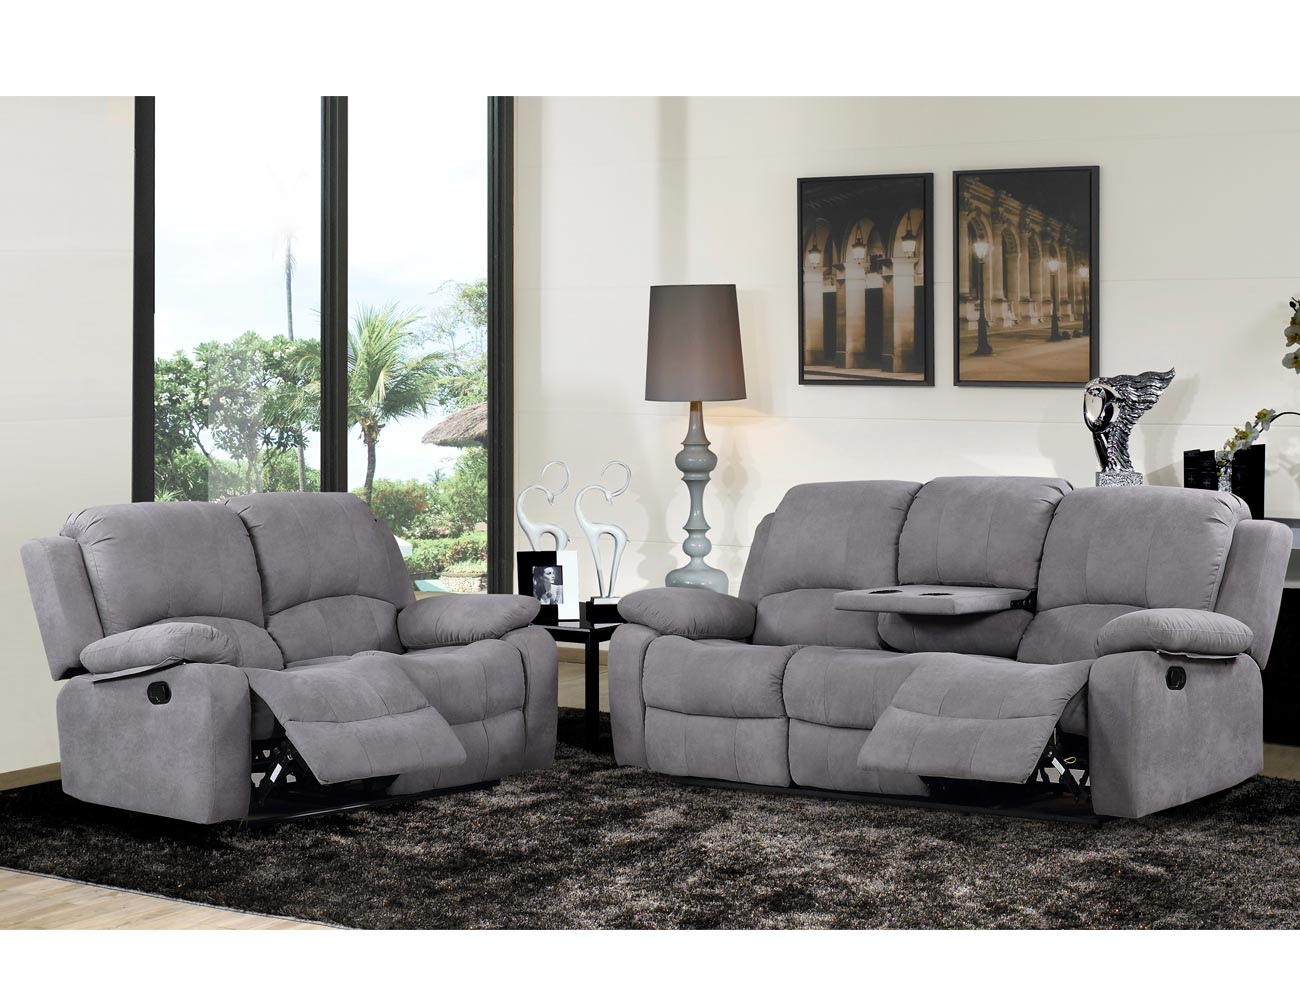 Sofa relax bandeja copas auxiliar 3 plazas conjunto1